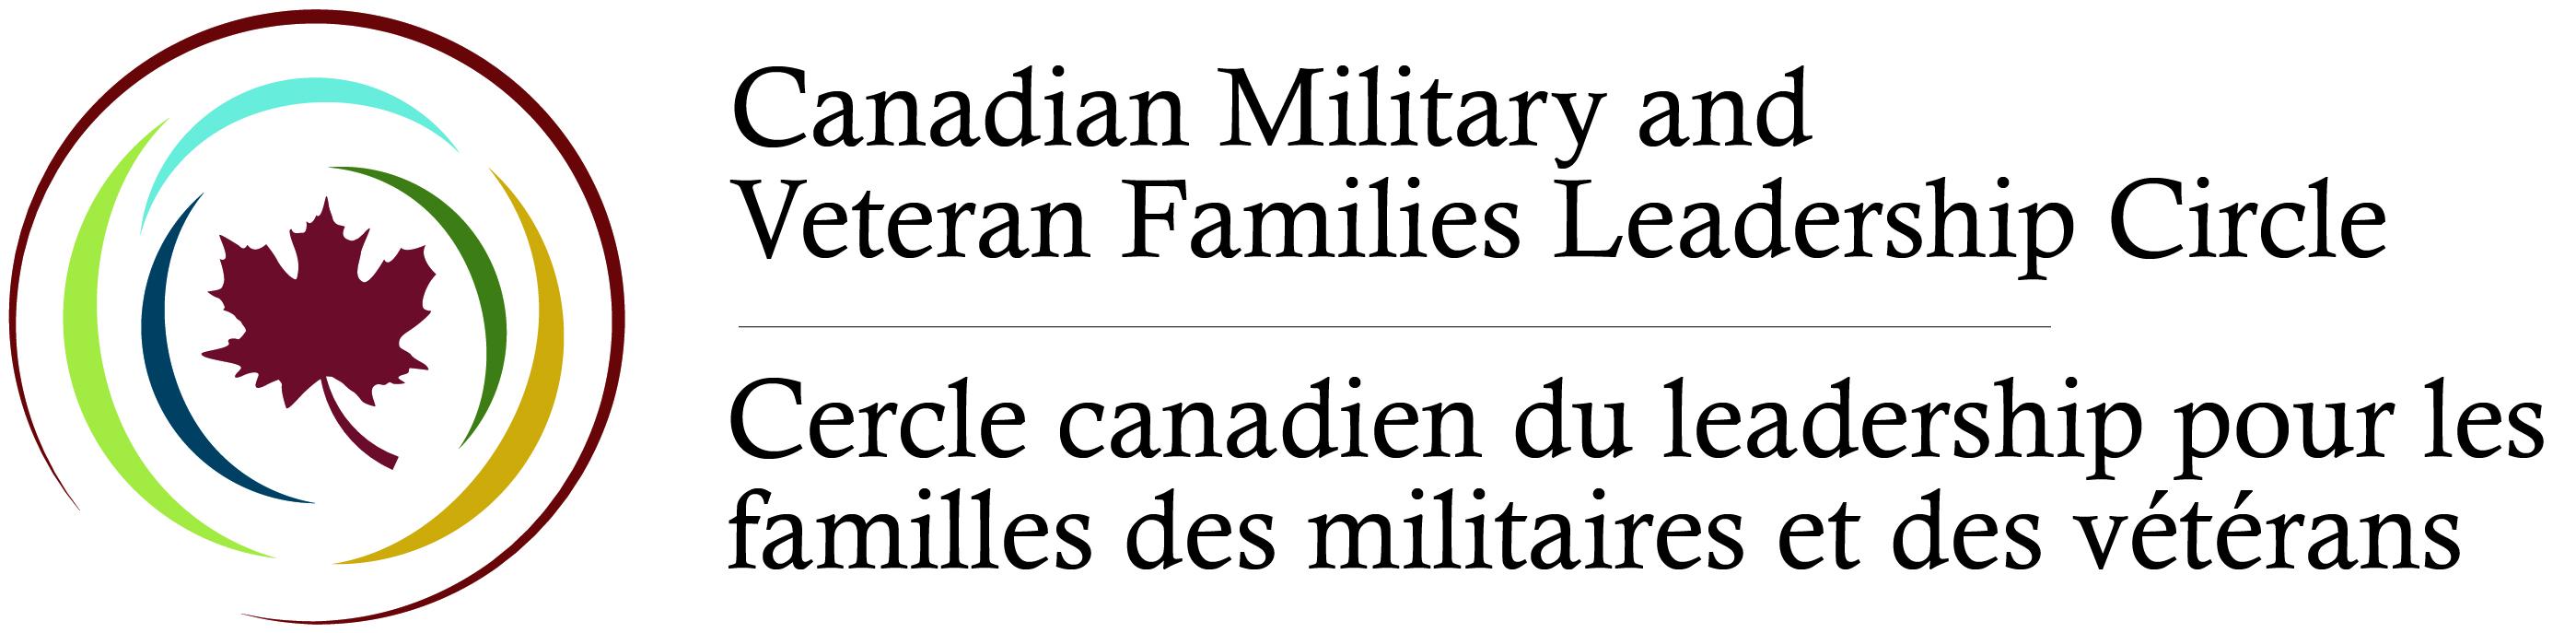 Canadian Military and Veteran Families Leadership Circle